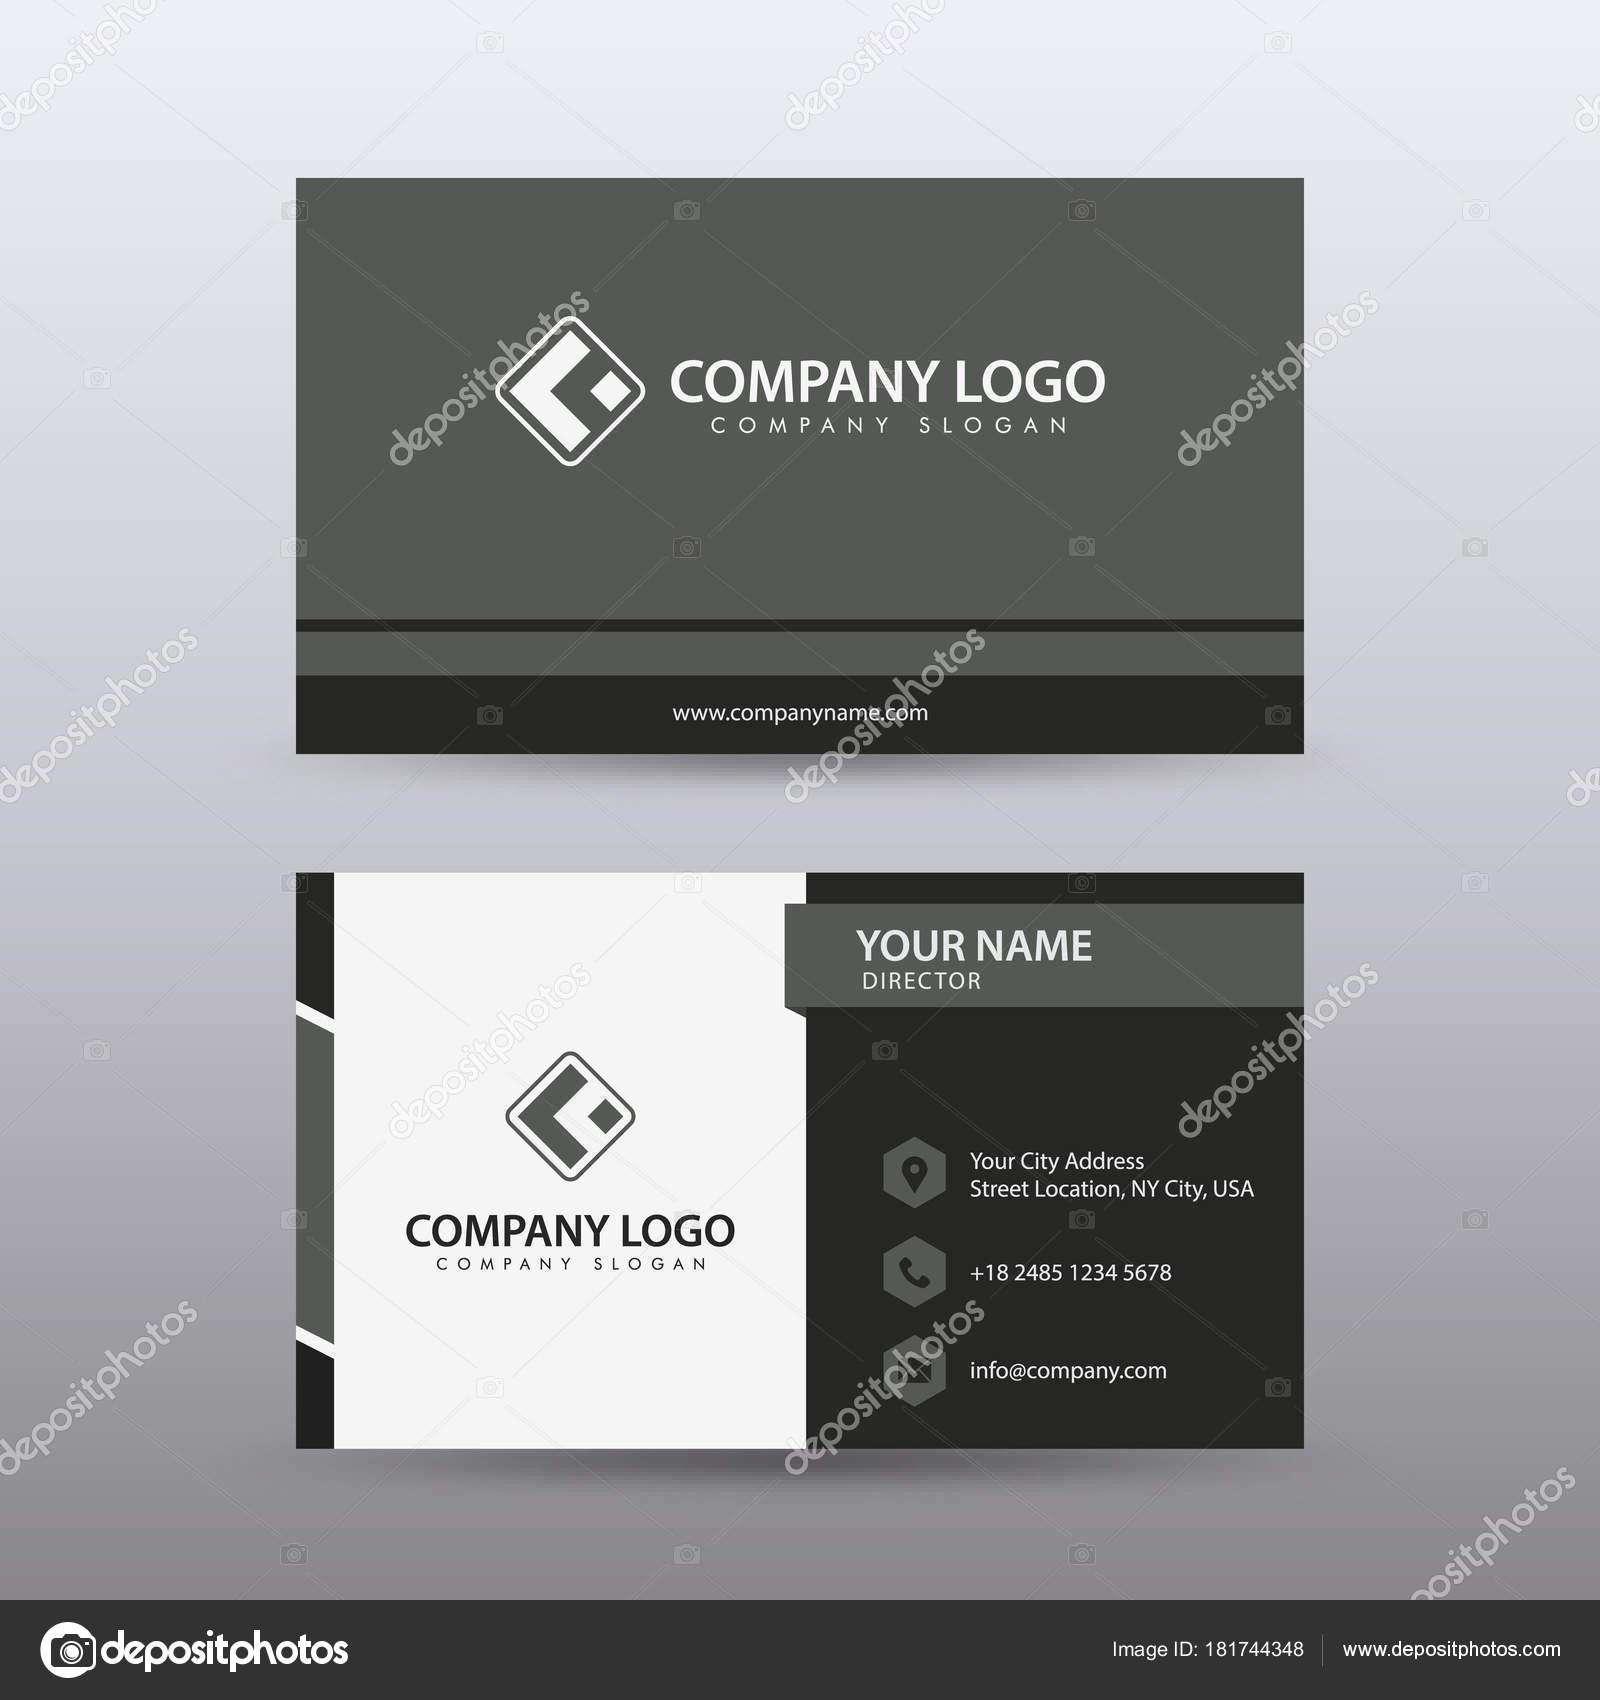 Modern creative and clean business card template with red black modern creative and clean business card template with red black color stock vector colourmoves